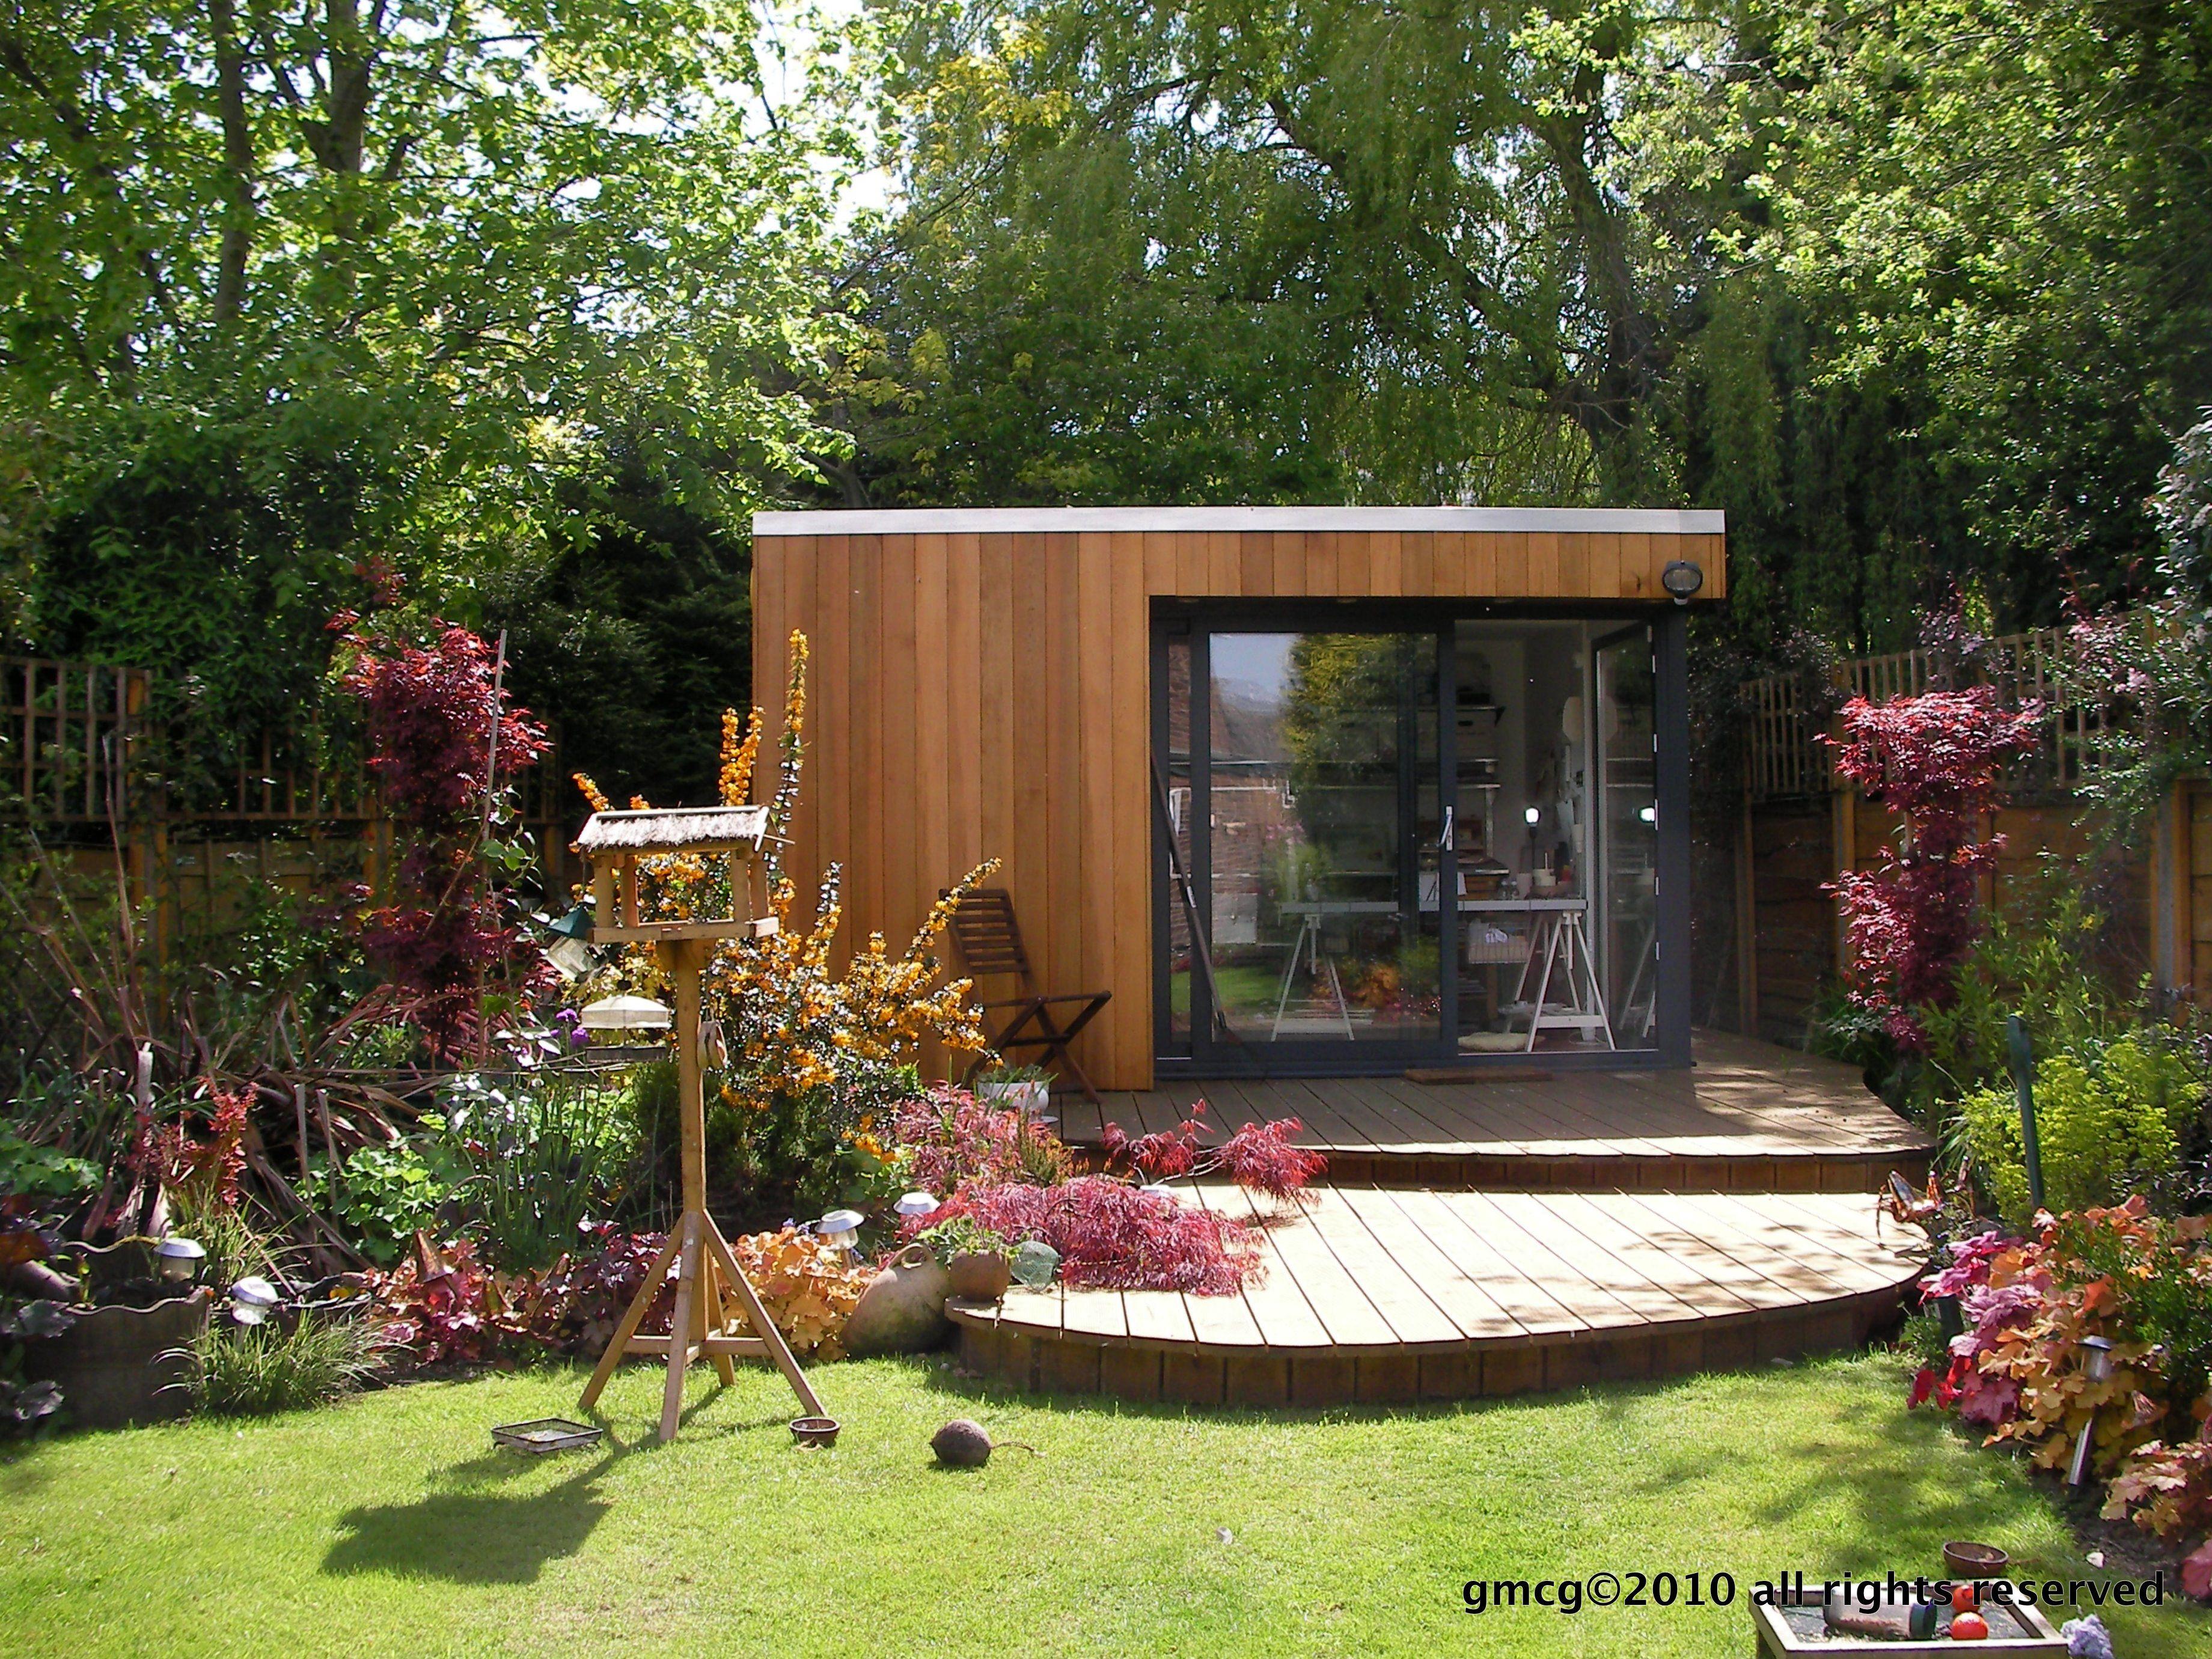 Classy Glass Small Portable Greenhouse